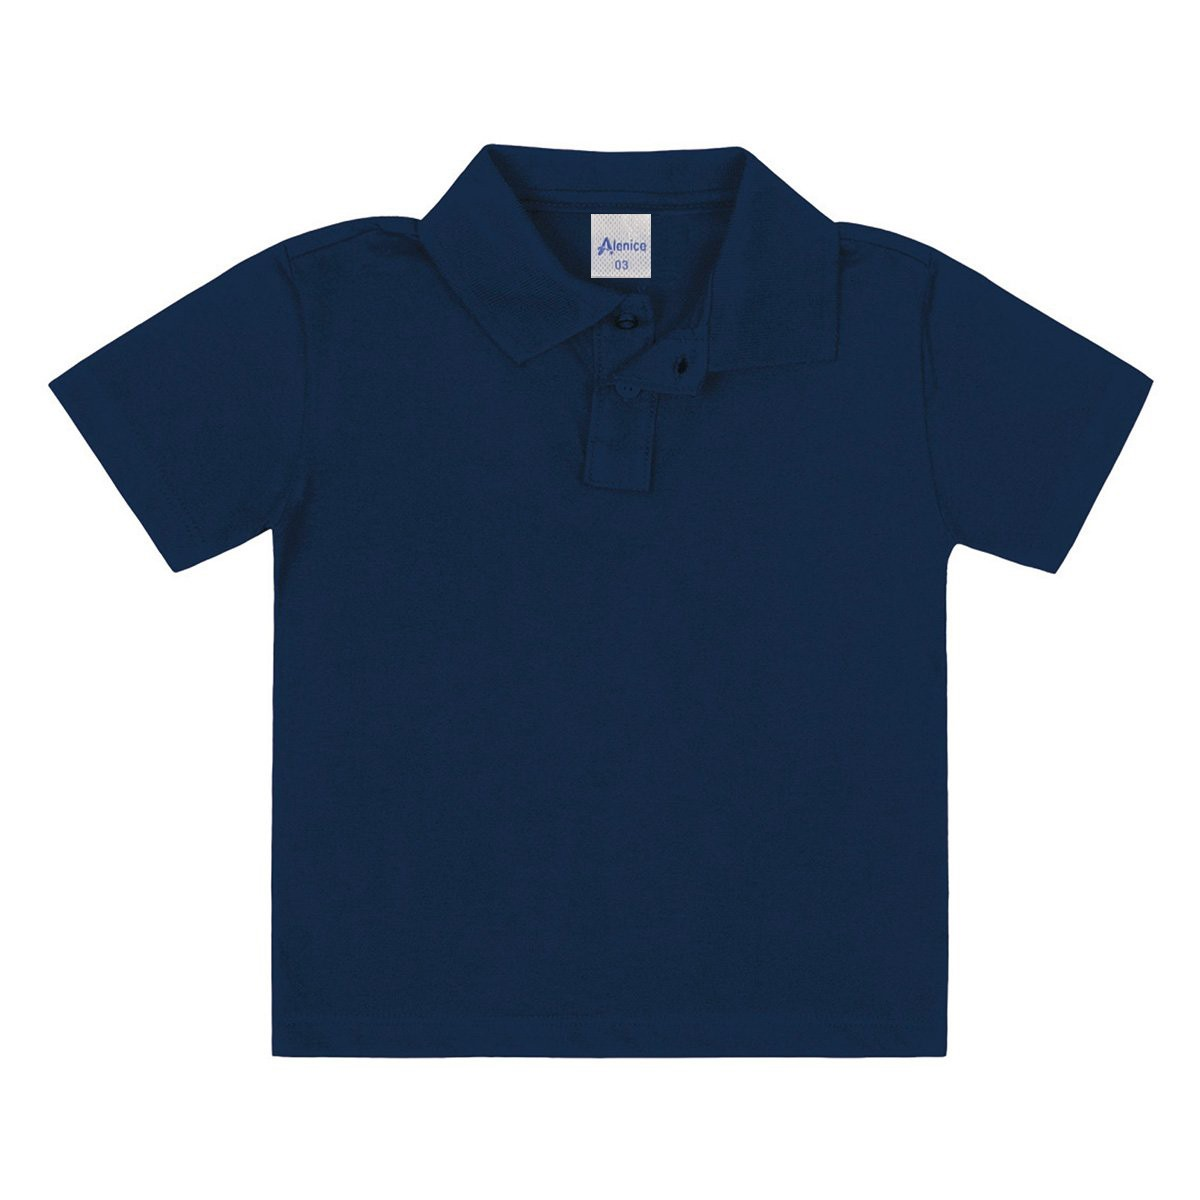 Camiseta Pólo Marinho Alenice